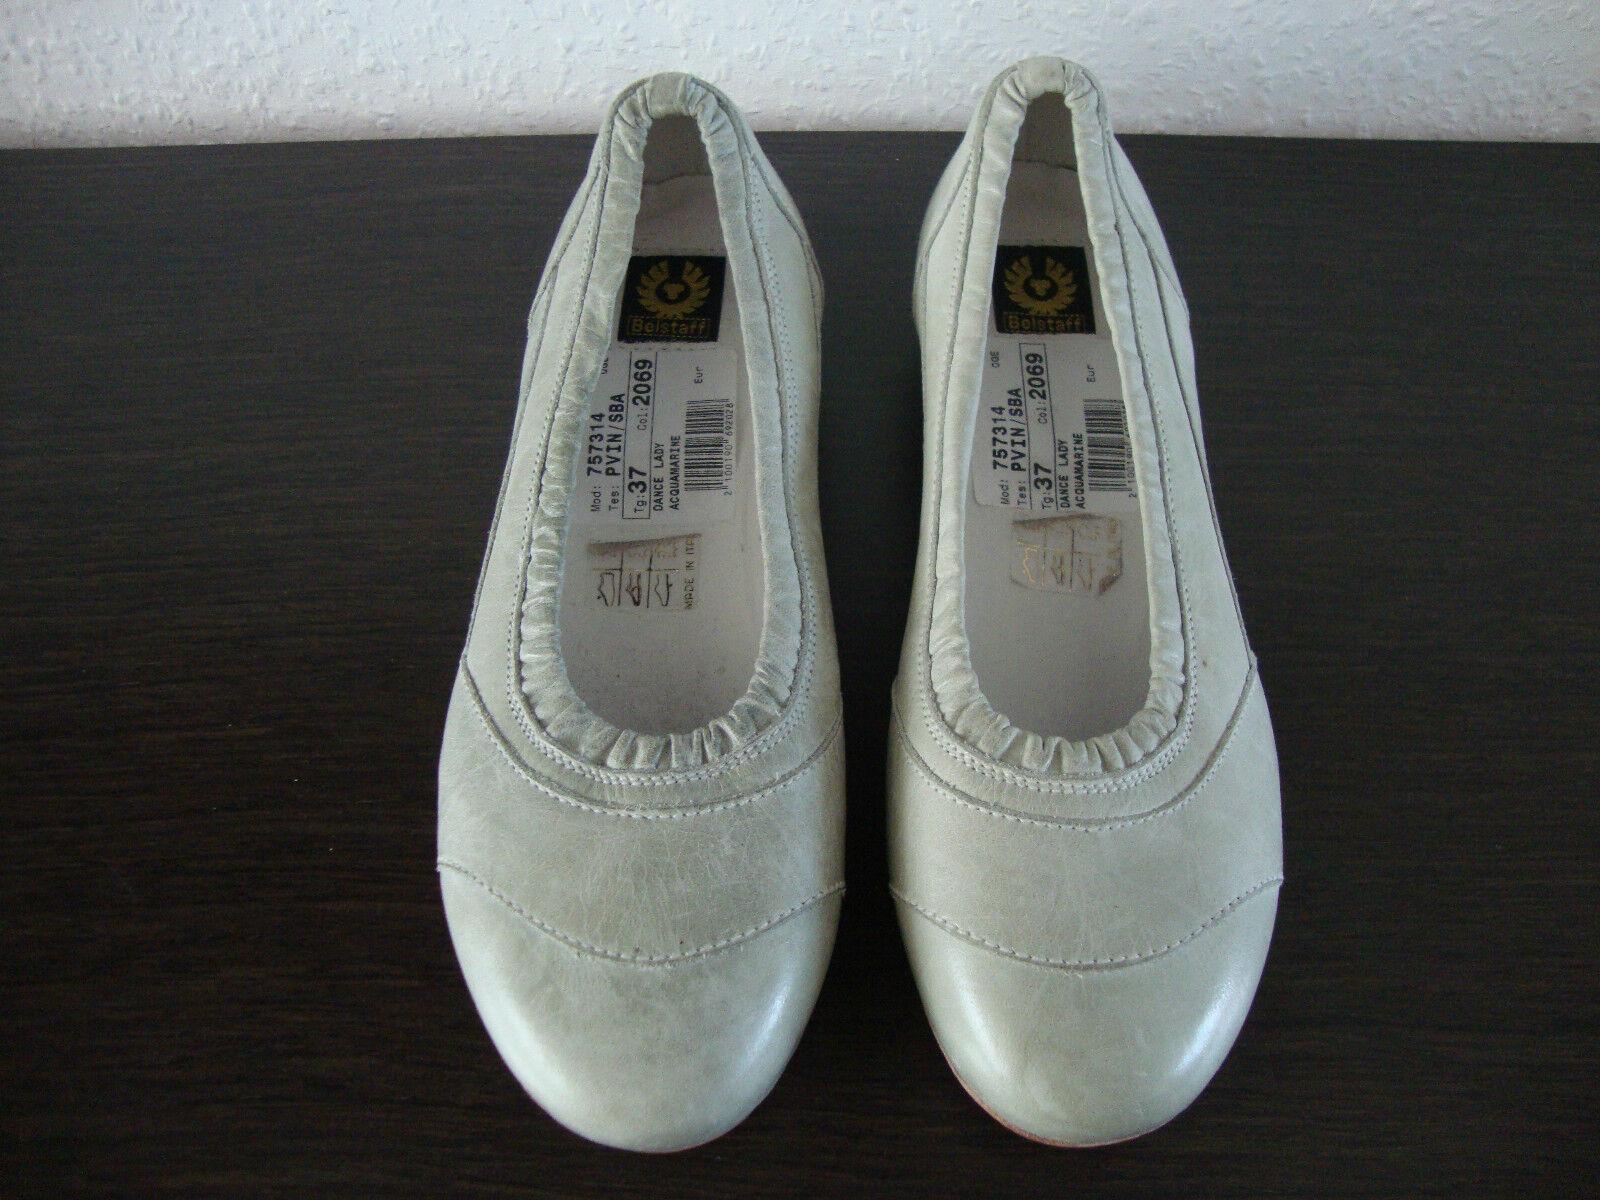 BELSTAFF DANCE LADY Ballerinas Gr.37 Schuhes Schuhe Damen Leder Acquamarine Gr.37 Ballerinas NEU 2bd5af